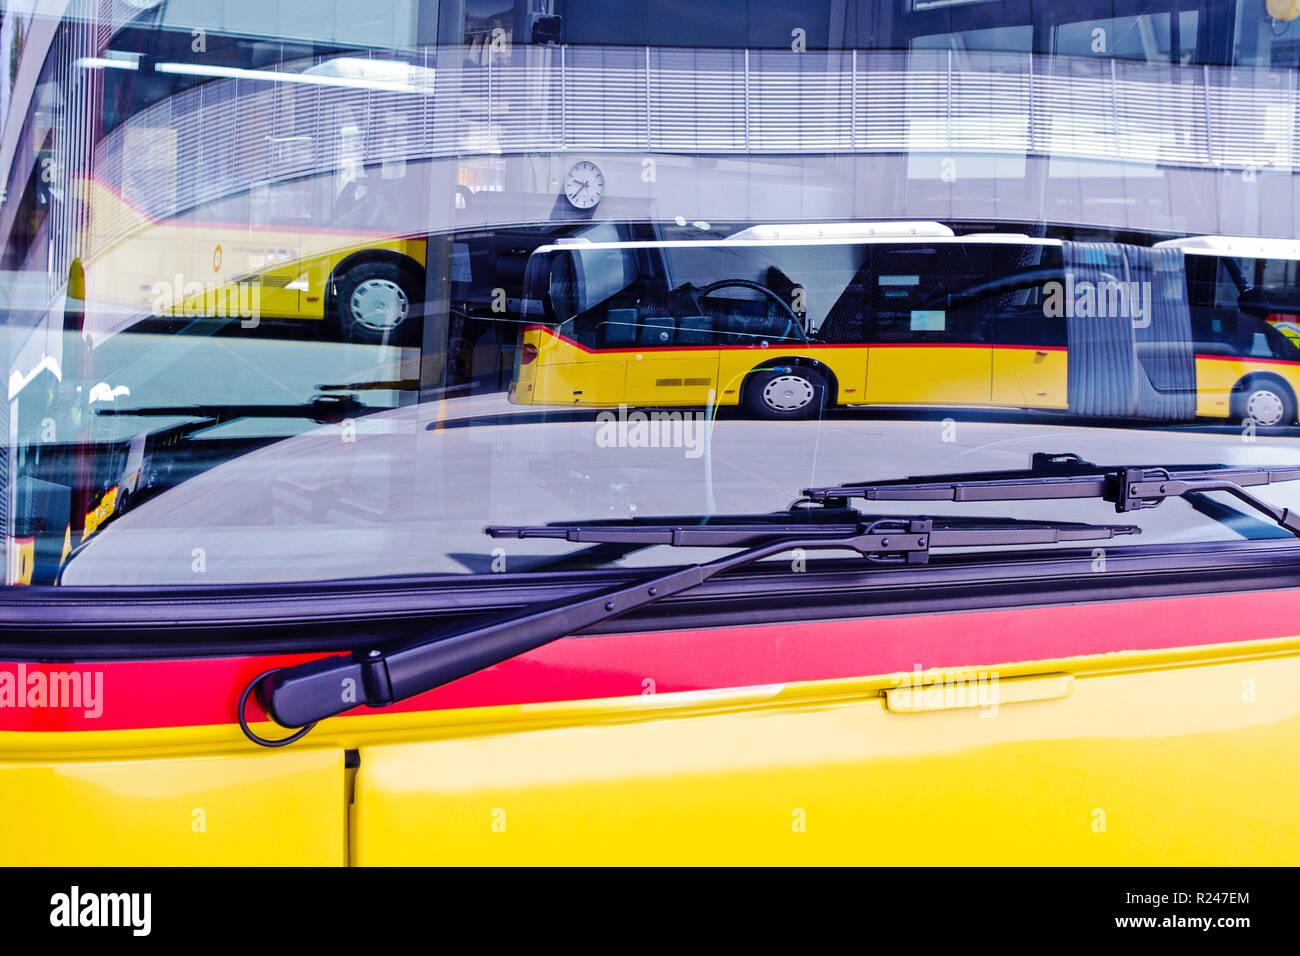 travel car mirrored in a windshield, postauto, switzerland - Stock Image